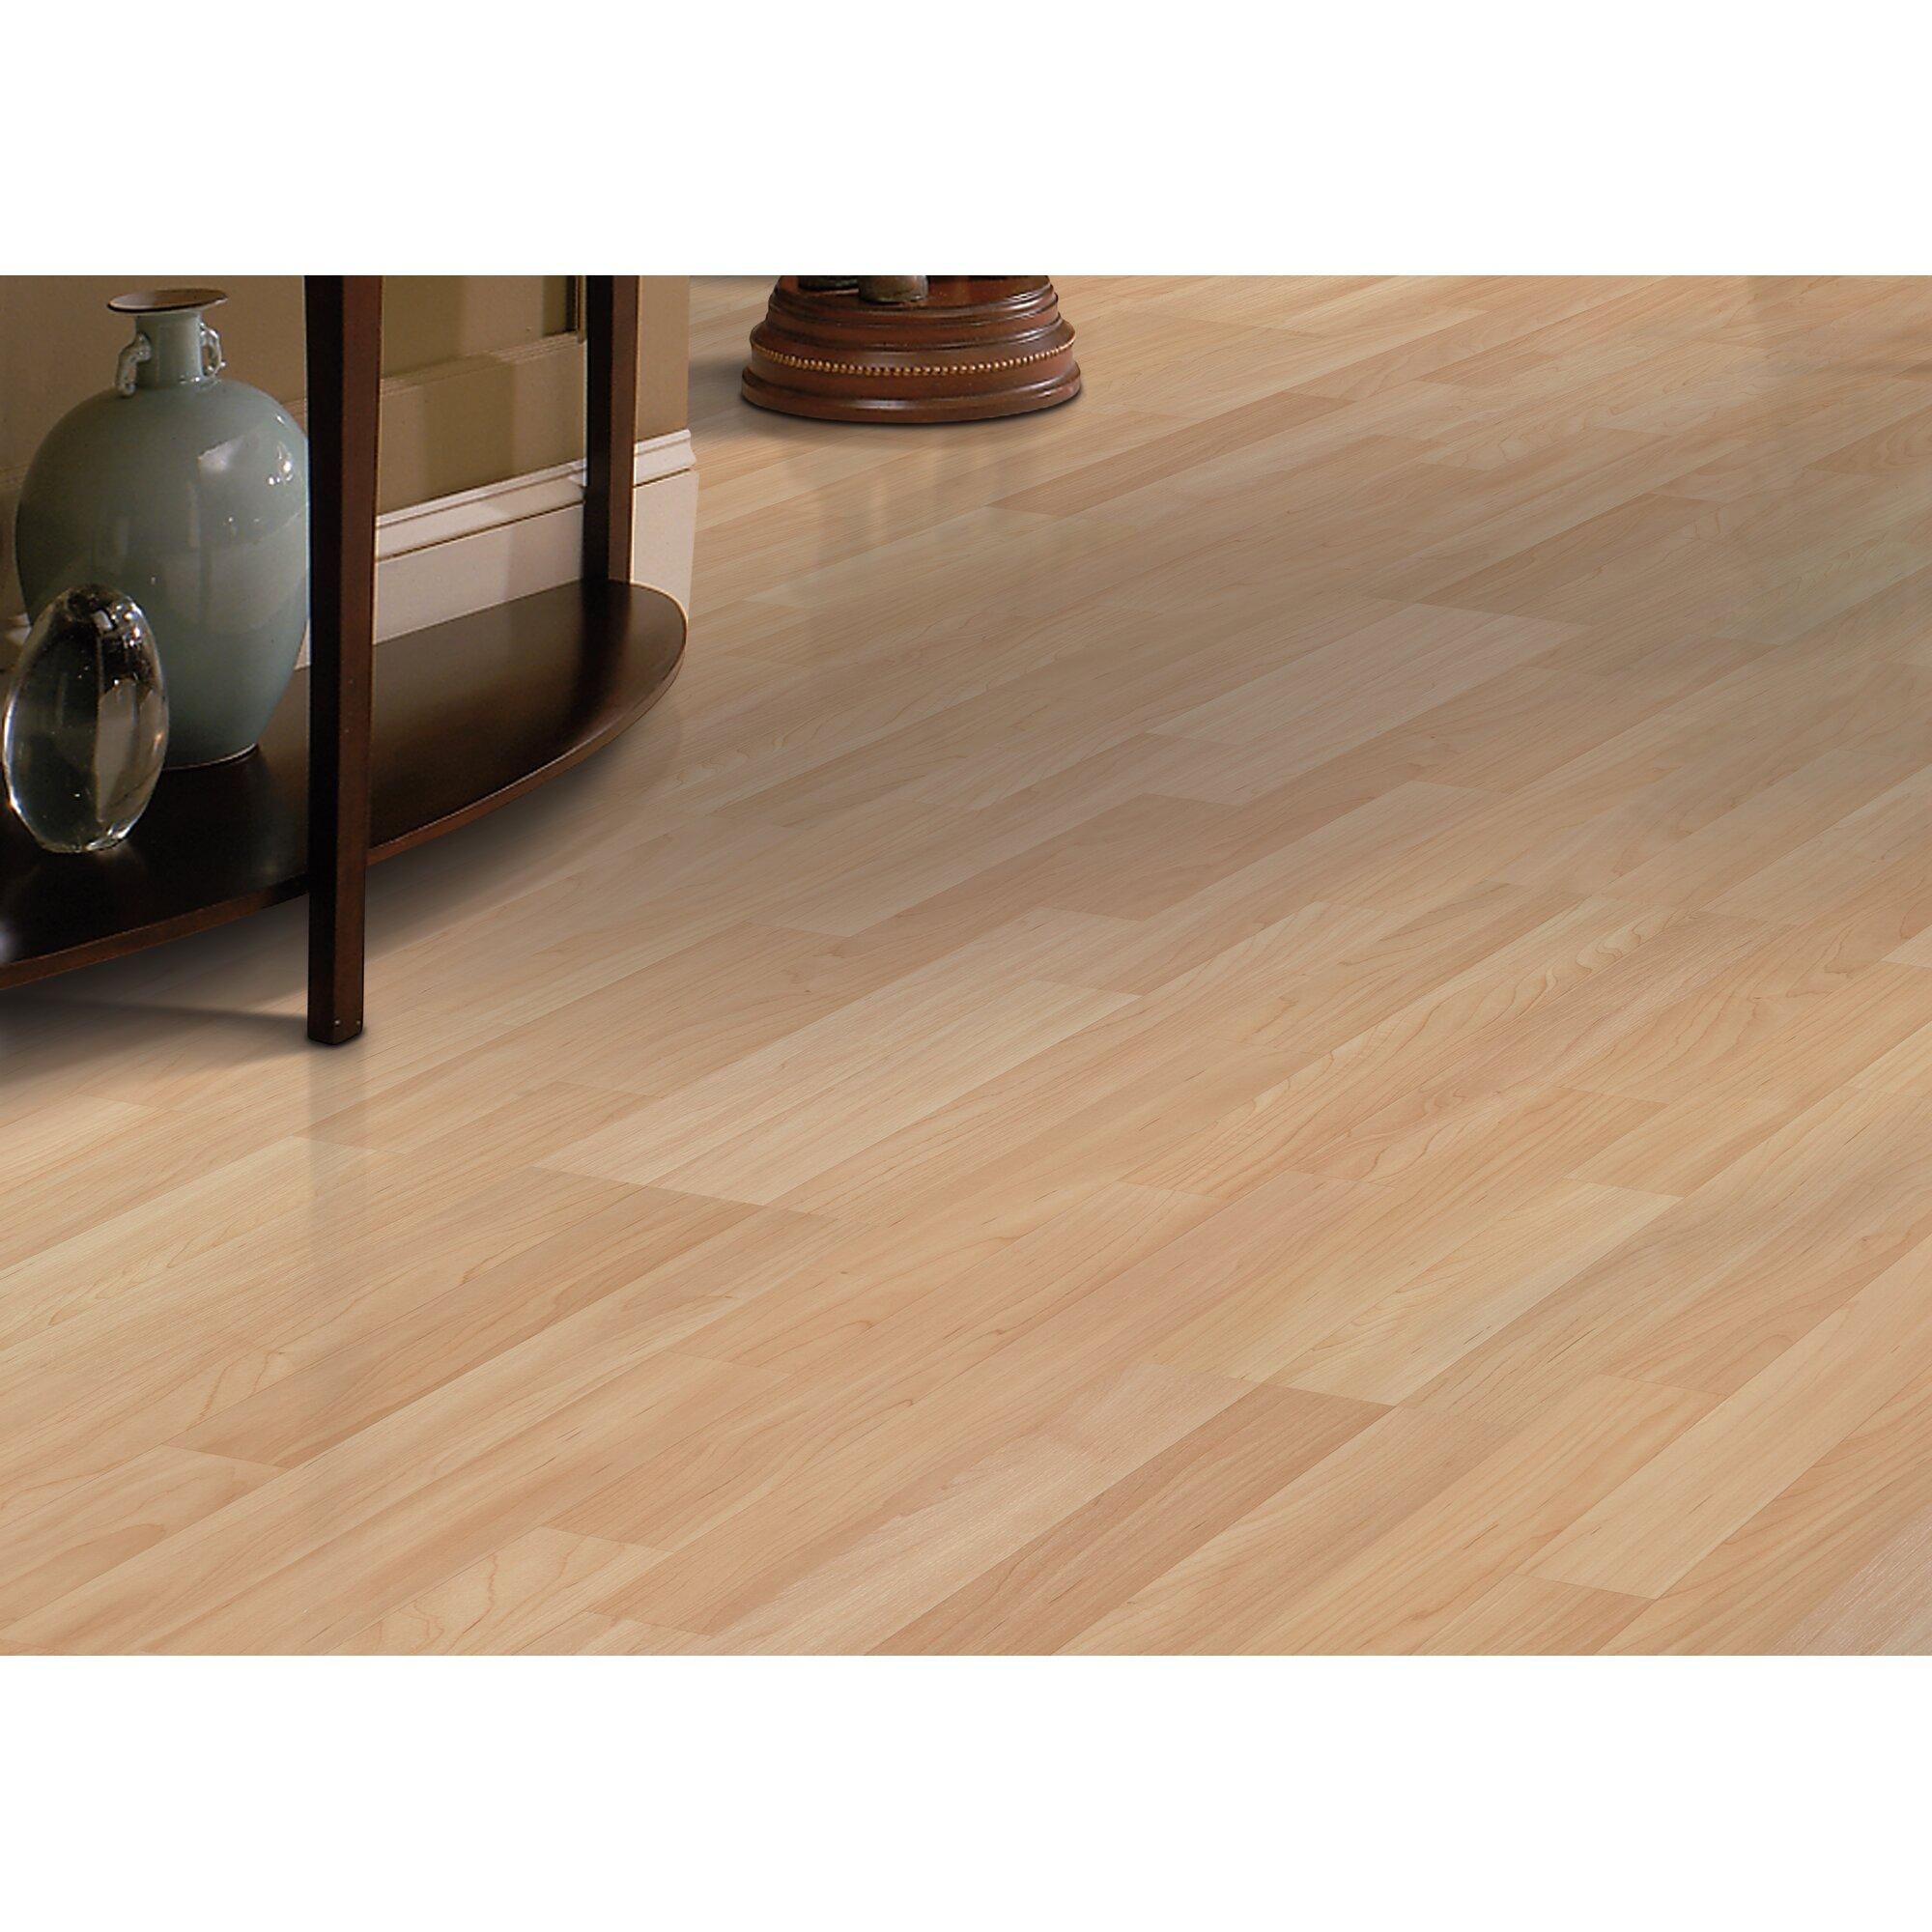 8mm Laminate Flooring quick step eligna spiced tea maple 8mm laminate flooring sample traditional laminate flooring Copeland 8 X 47 X 8mm Oak Laminate In Natural Maple